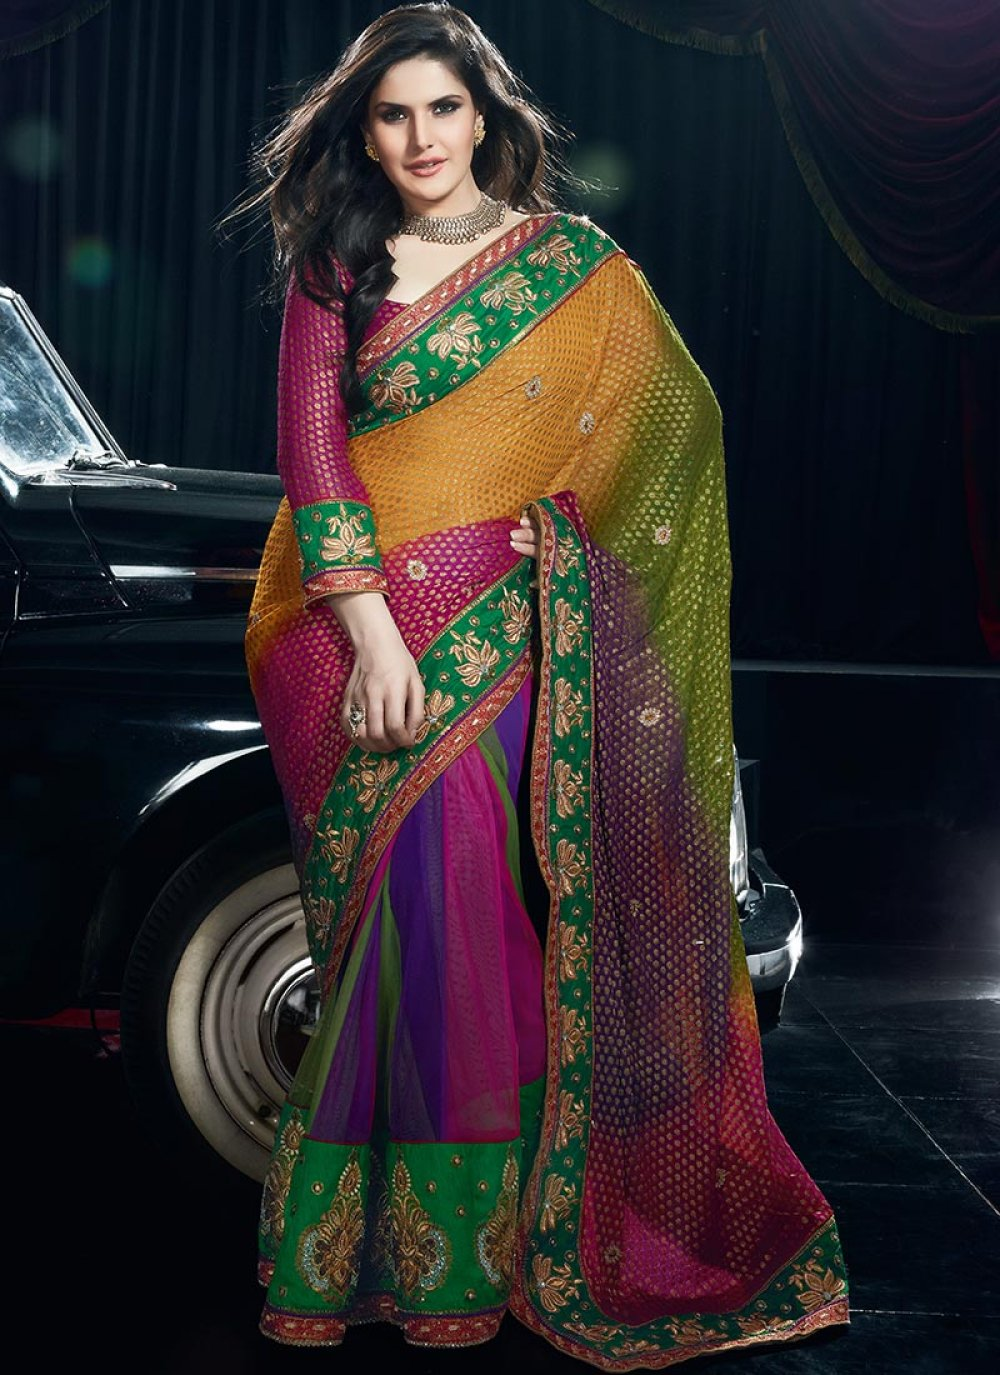 Multicolor Kalidar Lehenga Saree